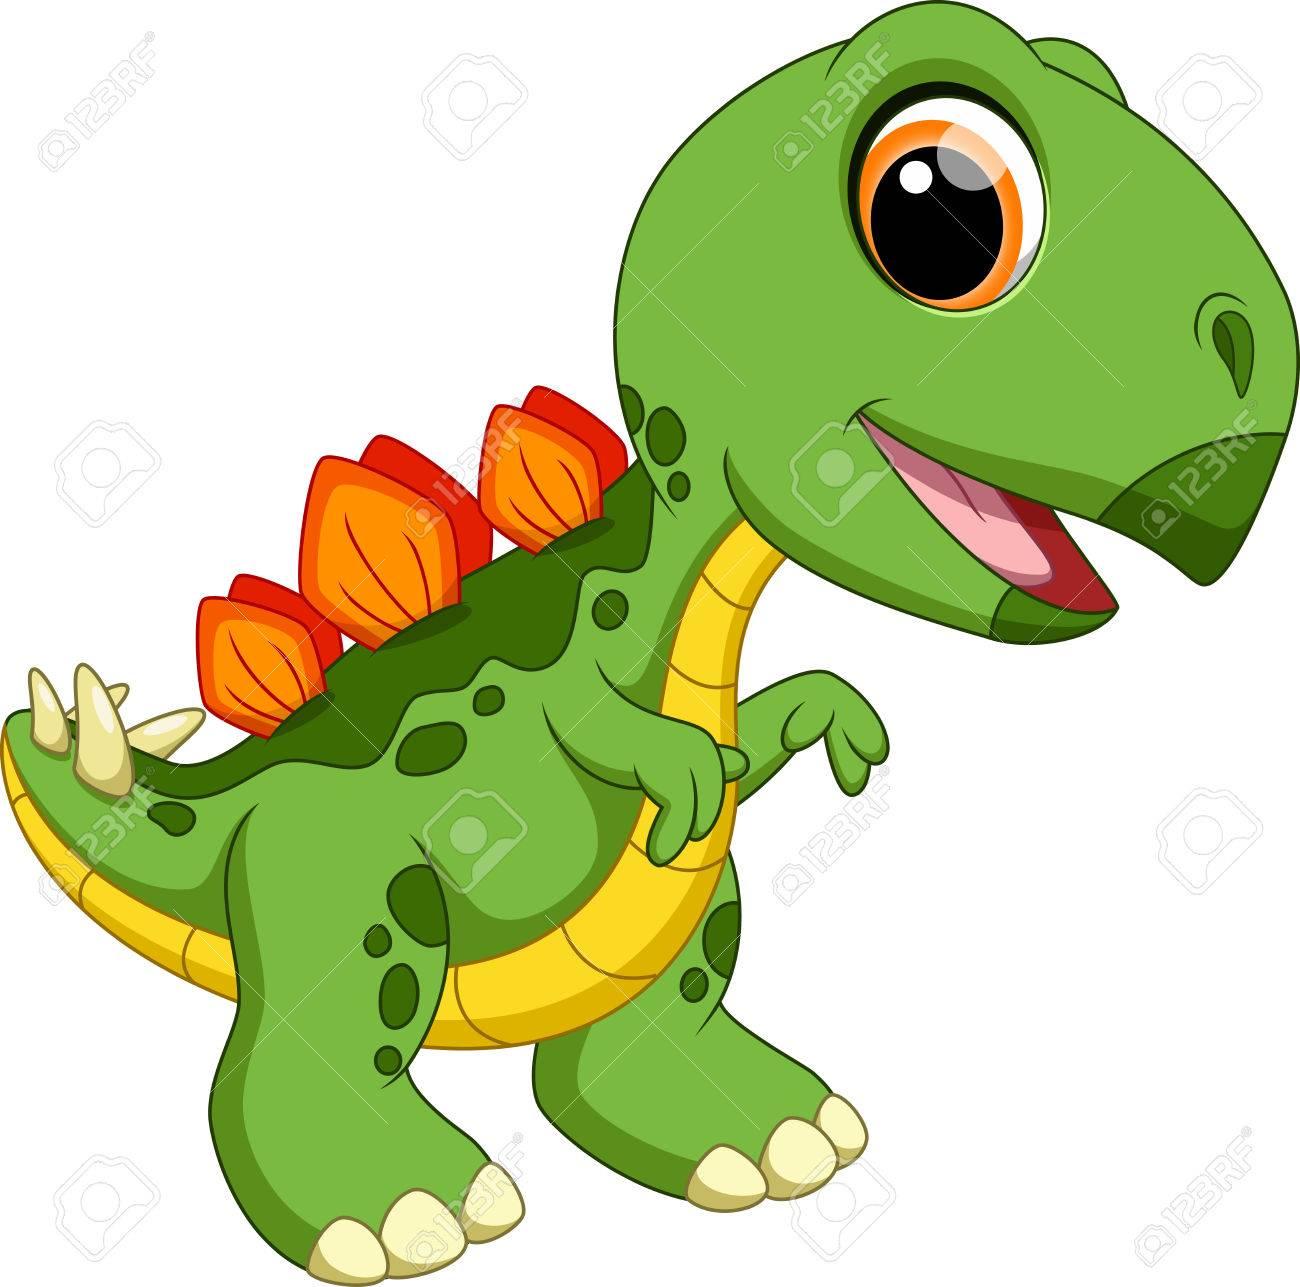 Uncategorized Cute Stegosaurus cute baby stegosaurus cartoon royalty free cliparts vectors and stock vector 31293178